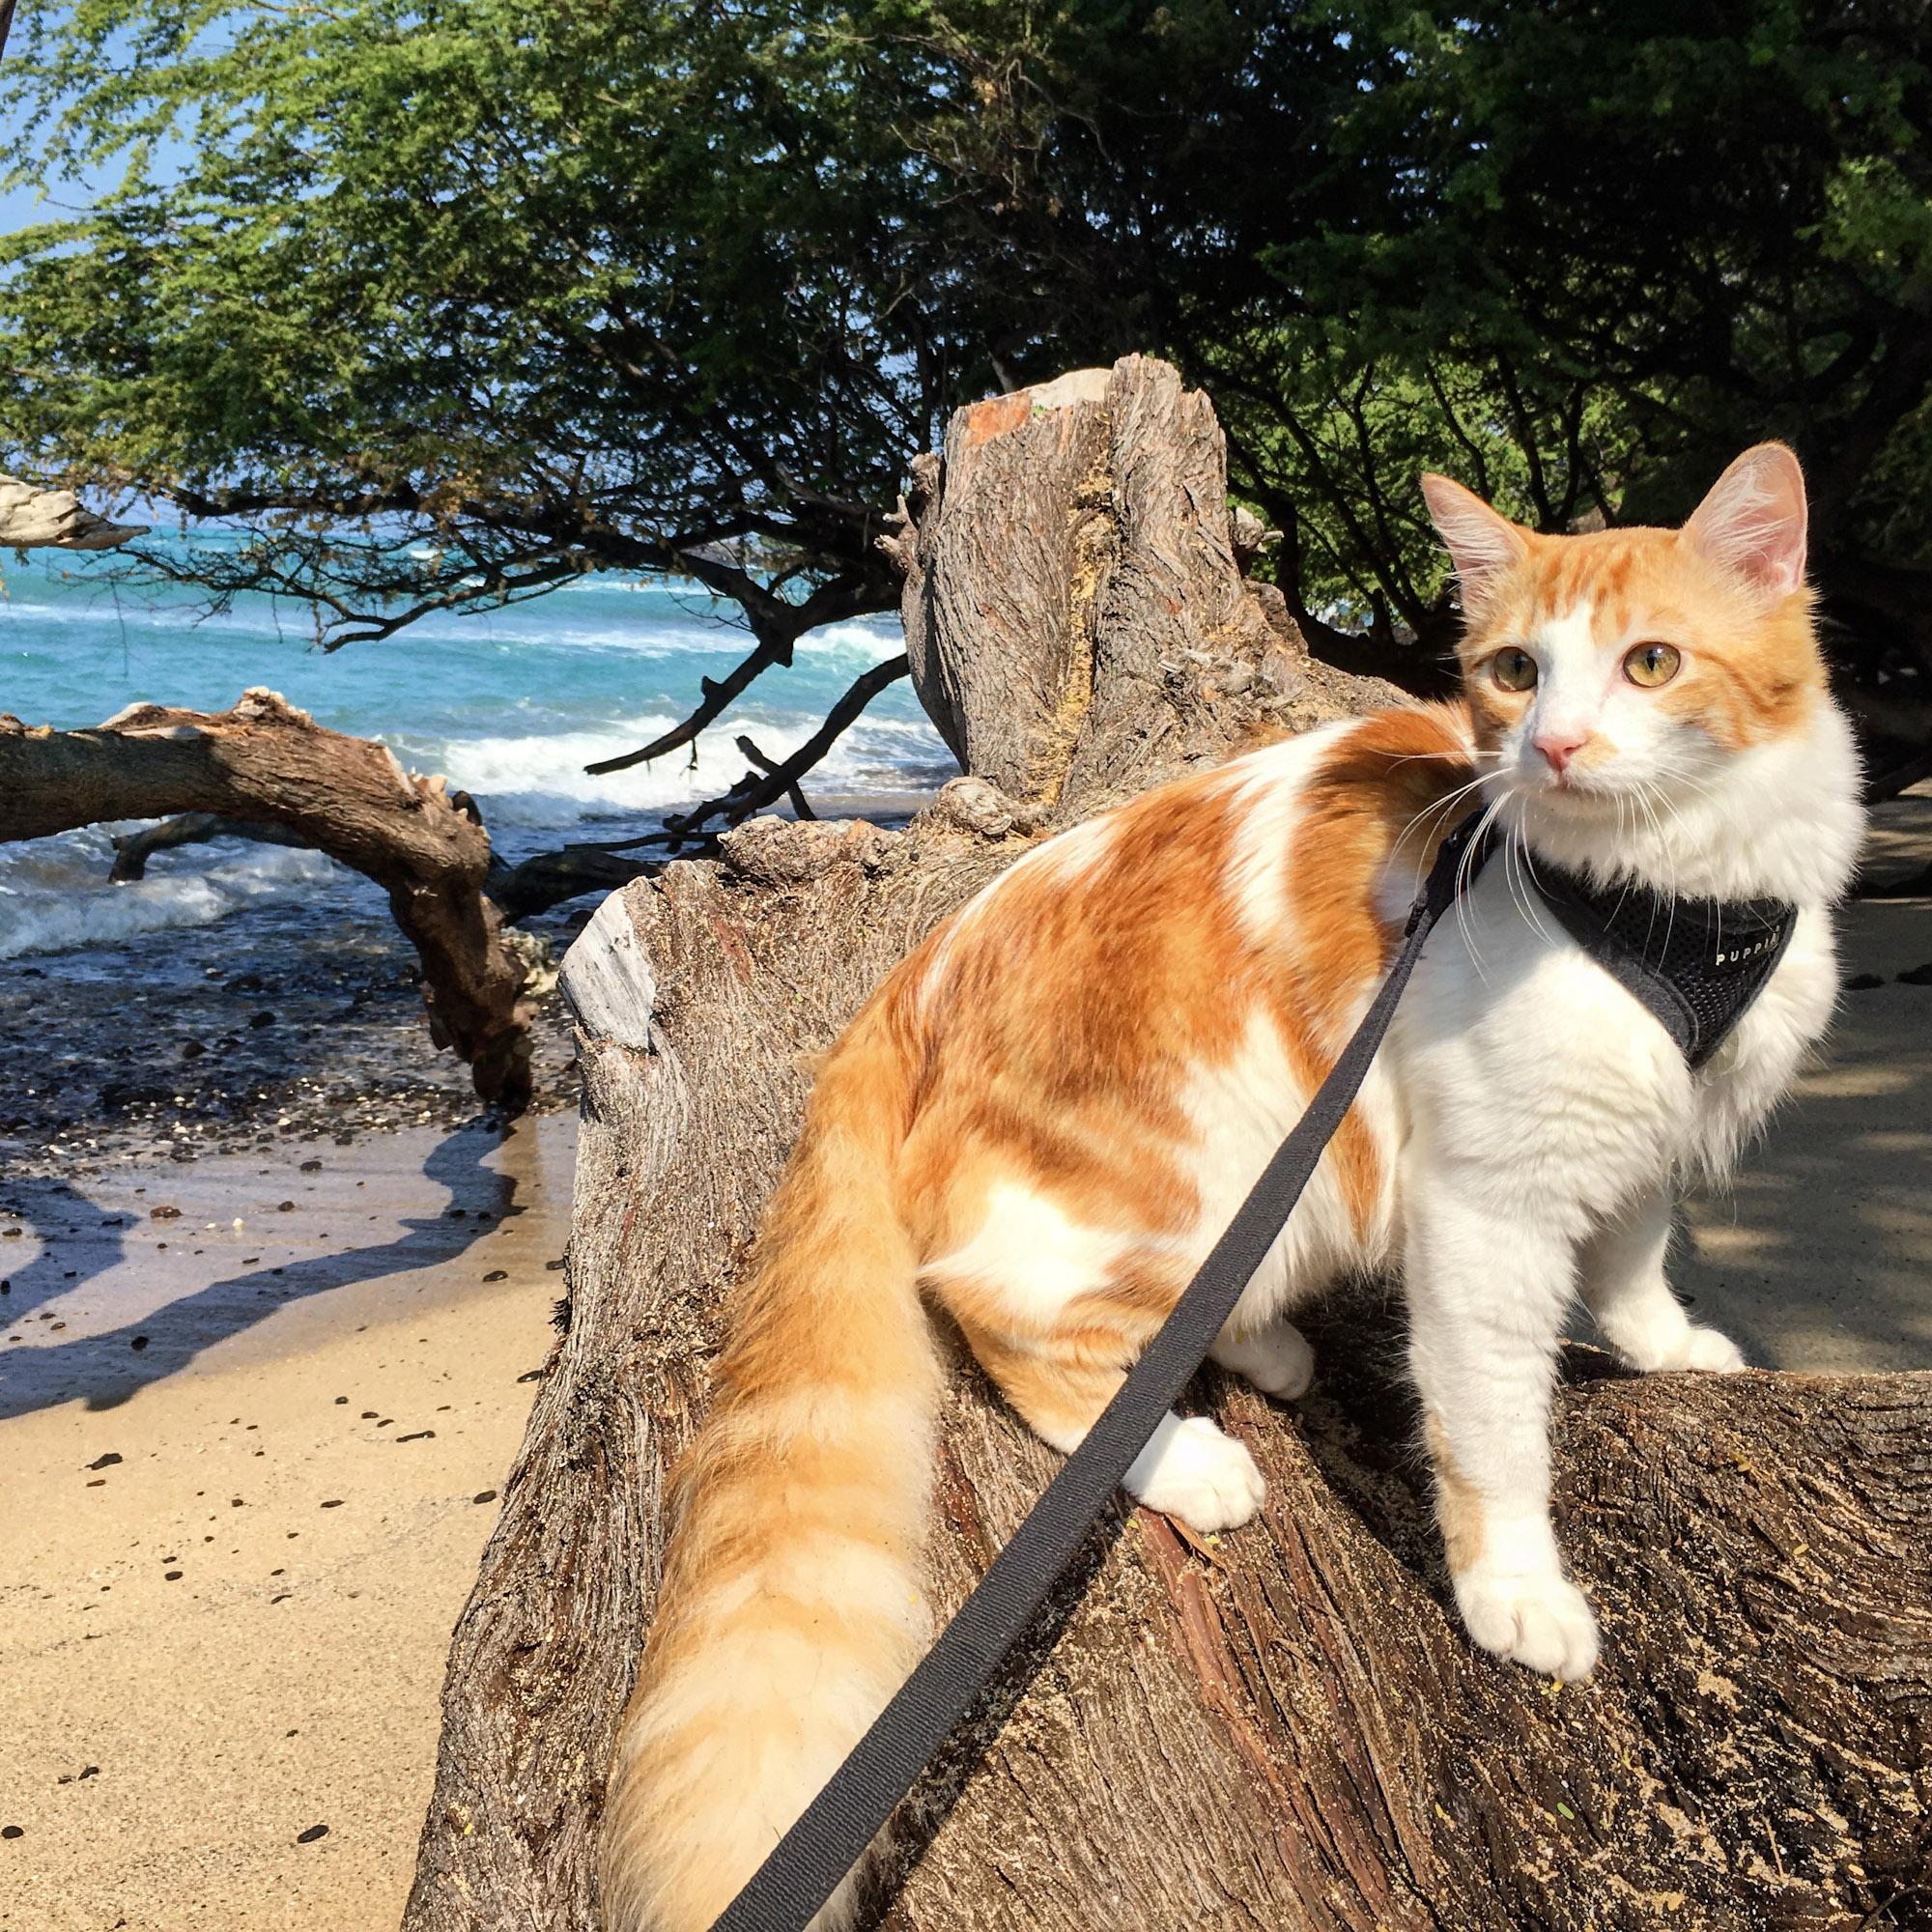 Atlas the adventure cat